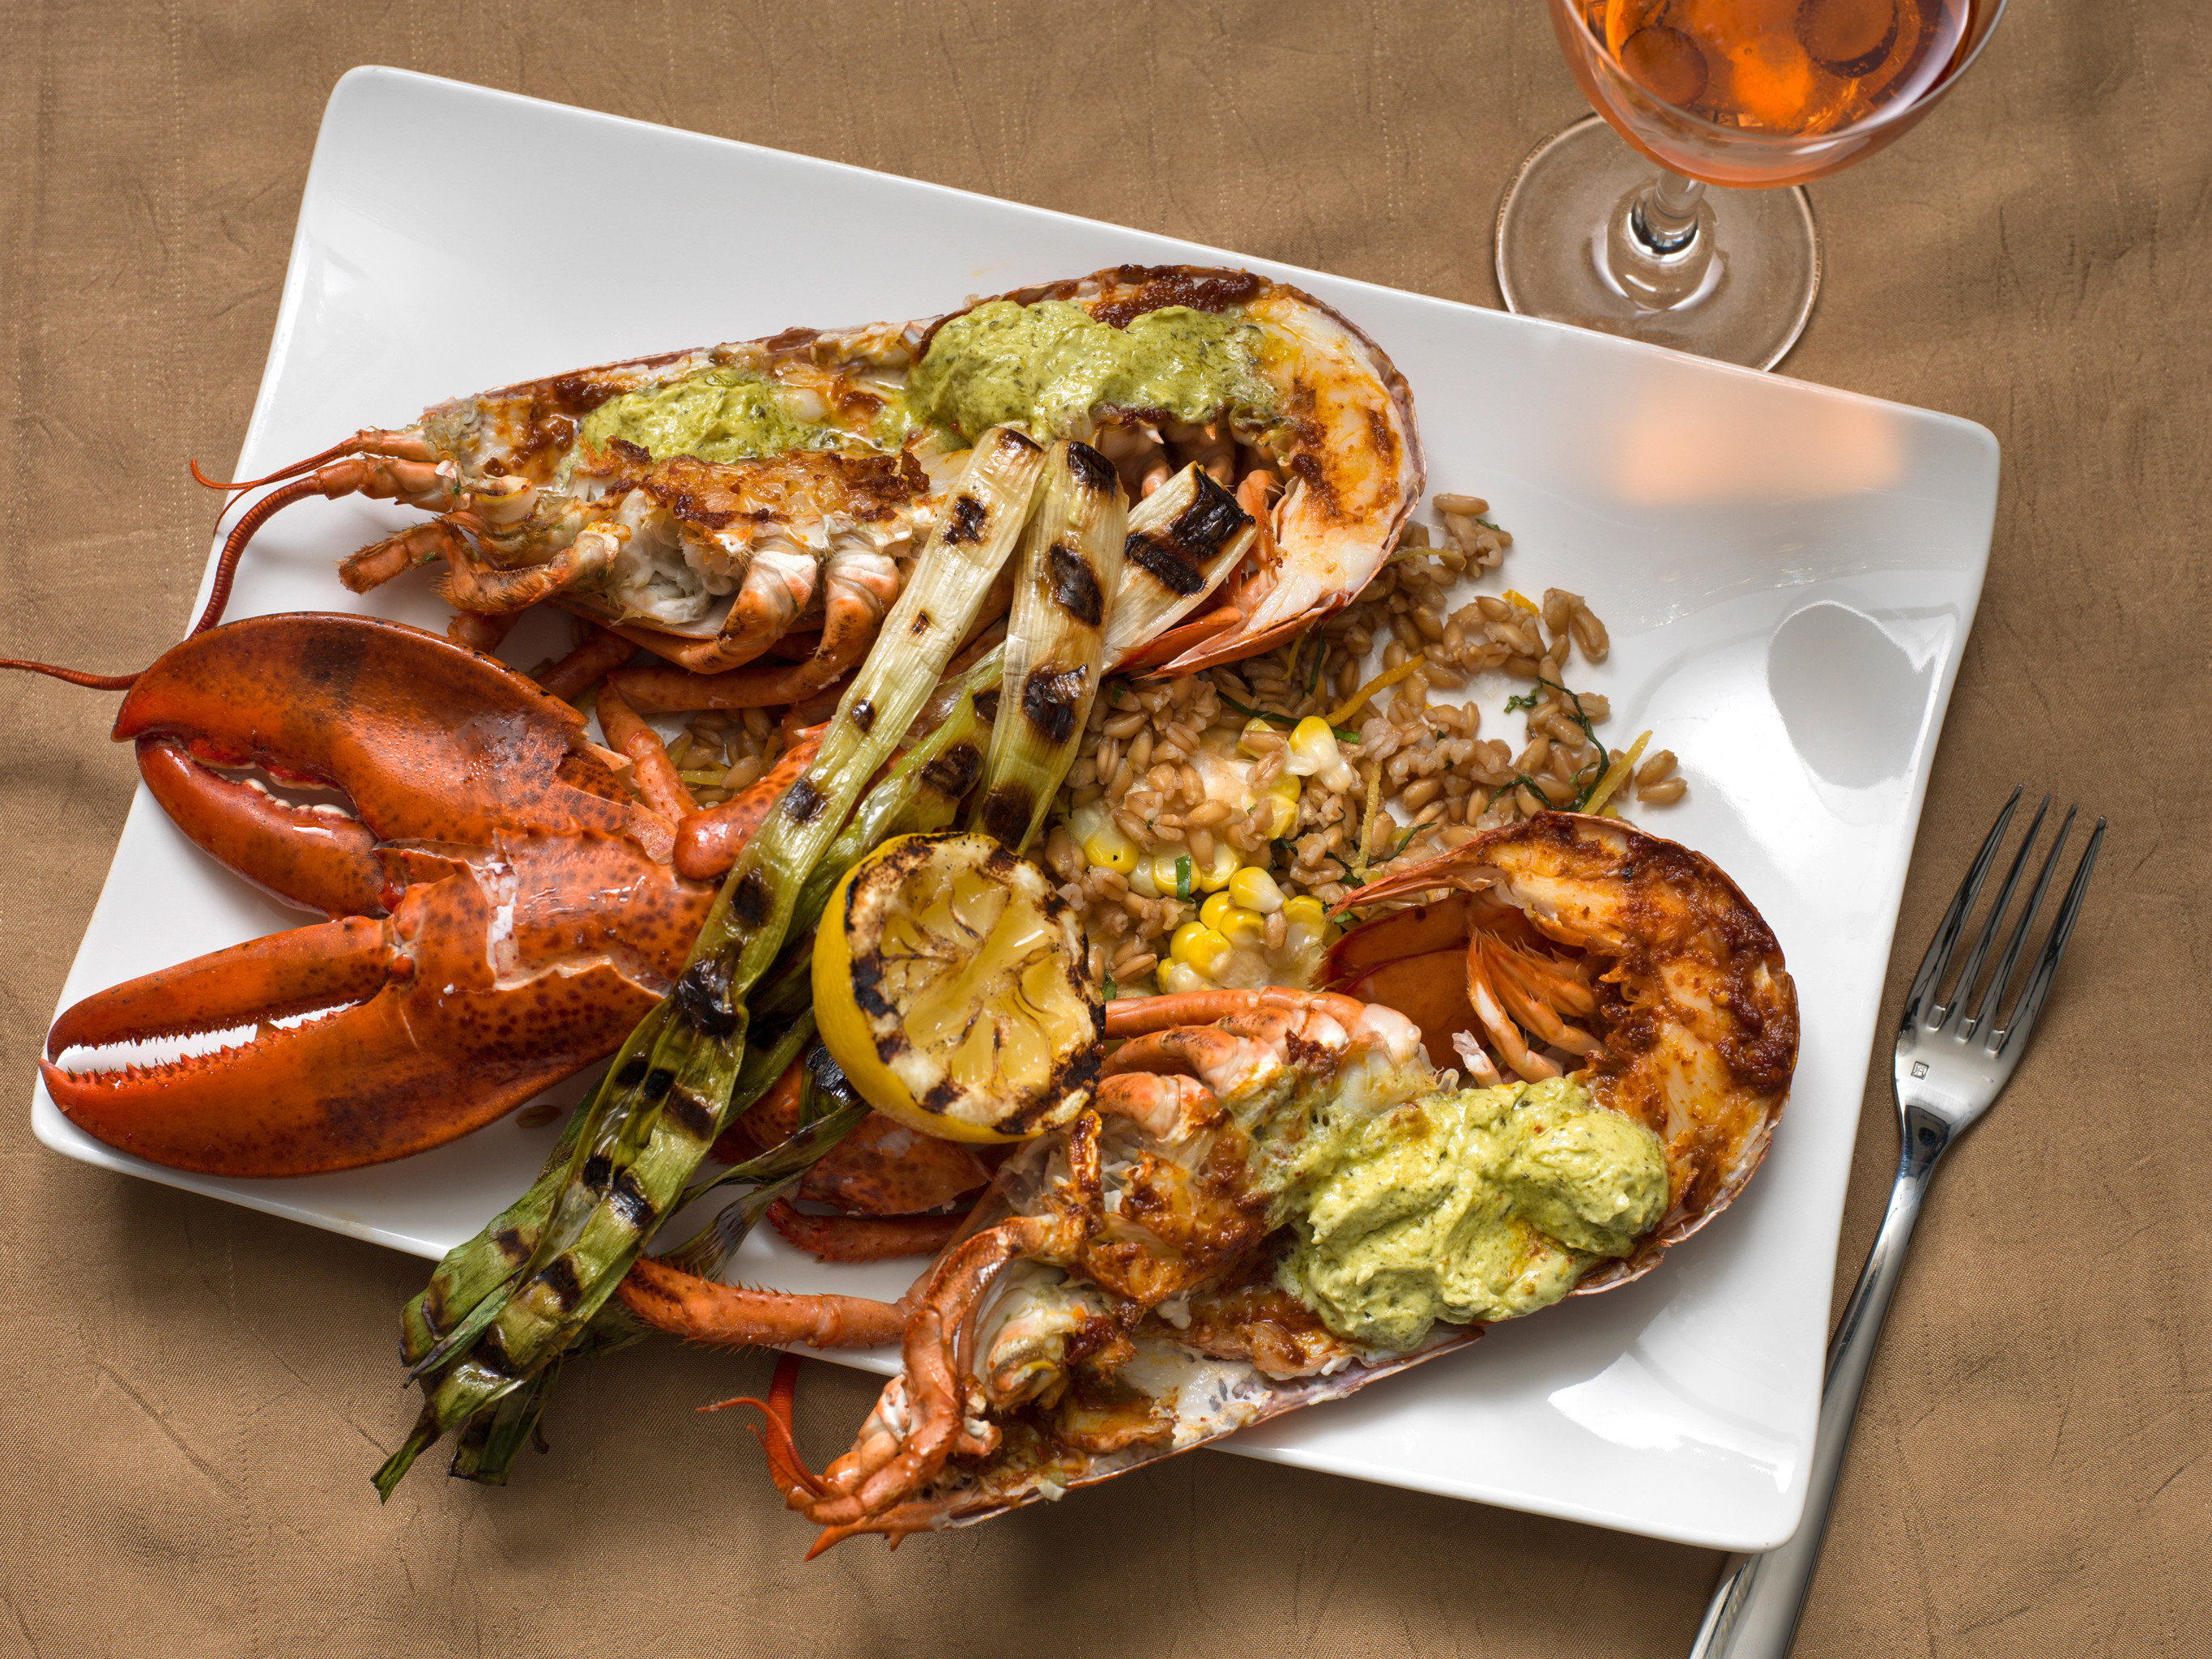 Dining Eat Luxury Resort food arthropod invertebrate plate animal Seafood cuisine fish animal source foods dungeness crab decapoda mussel meat lobster